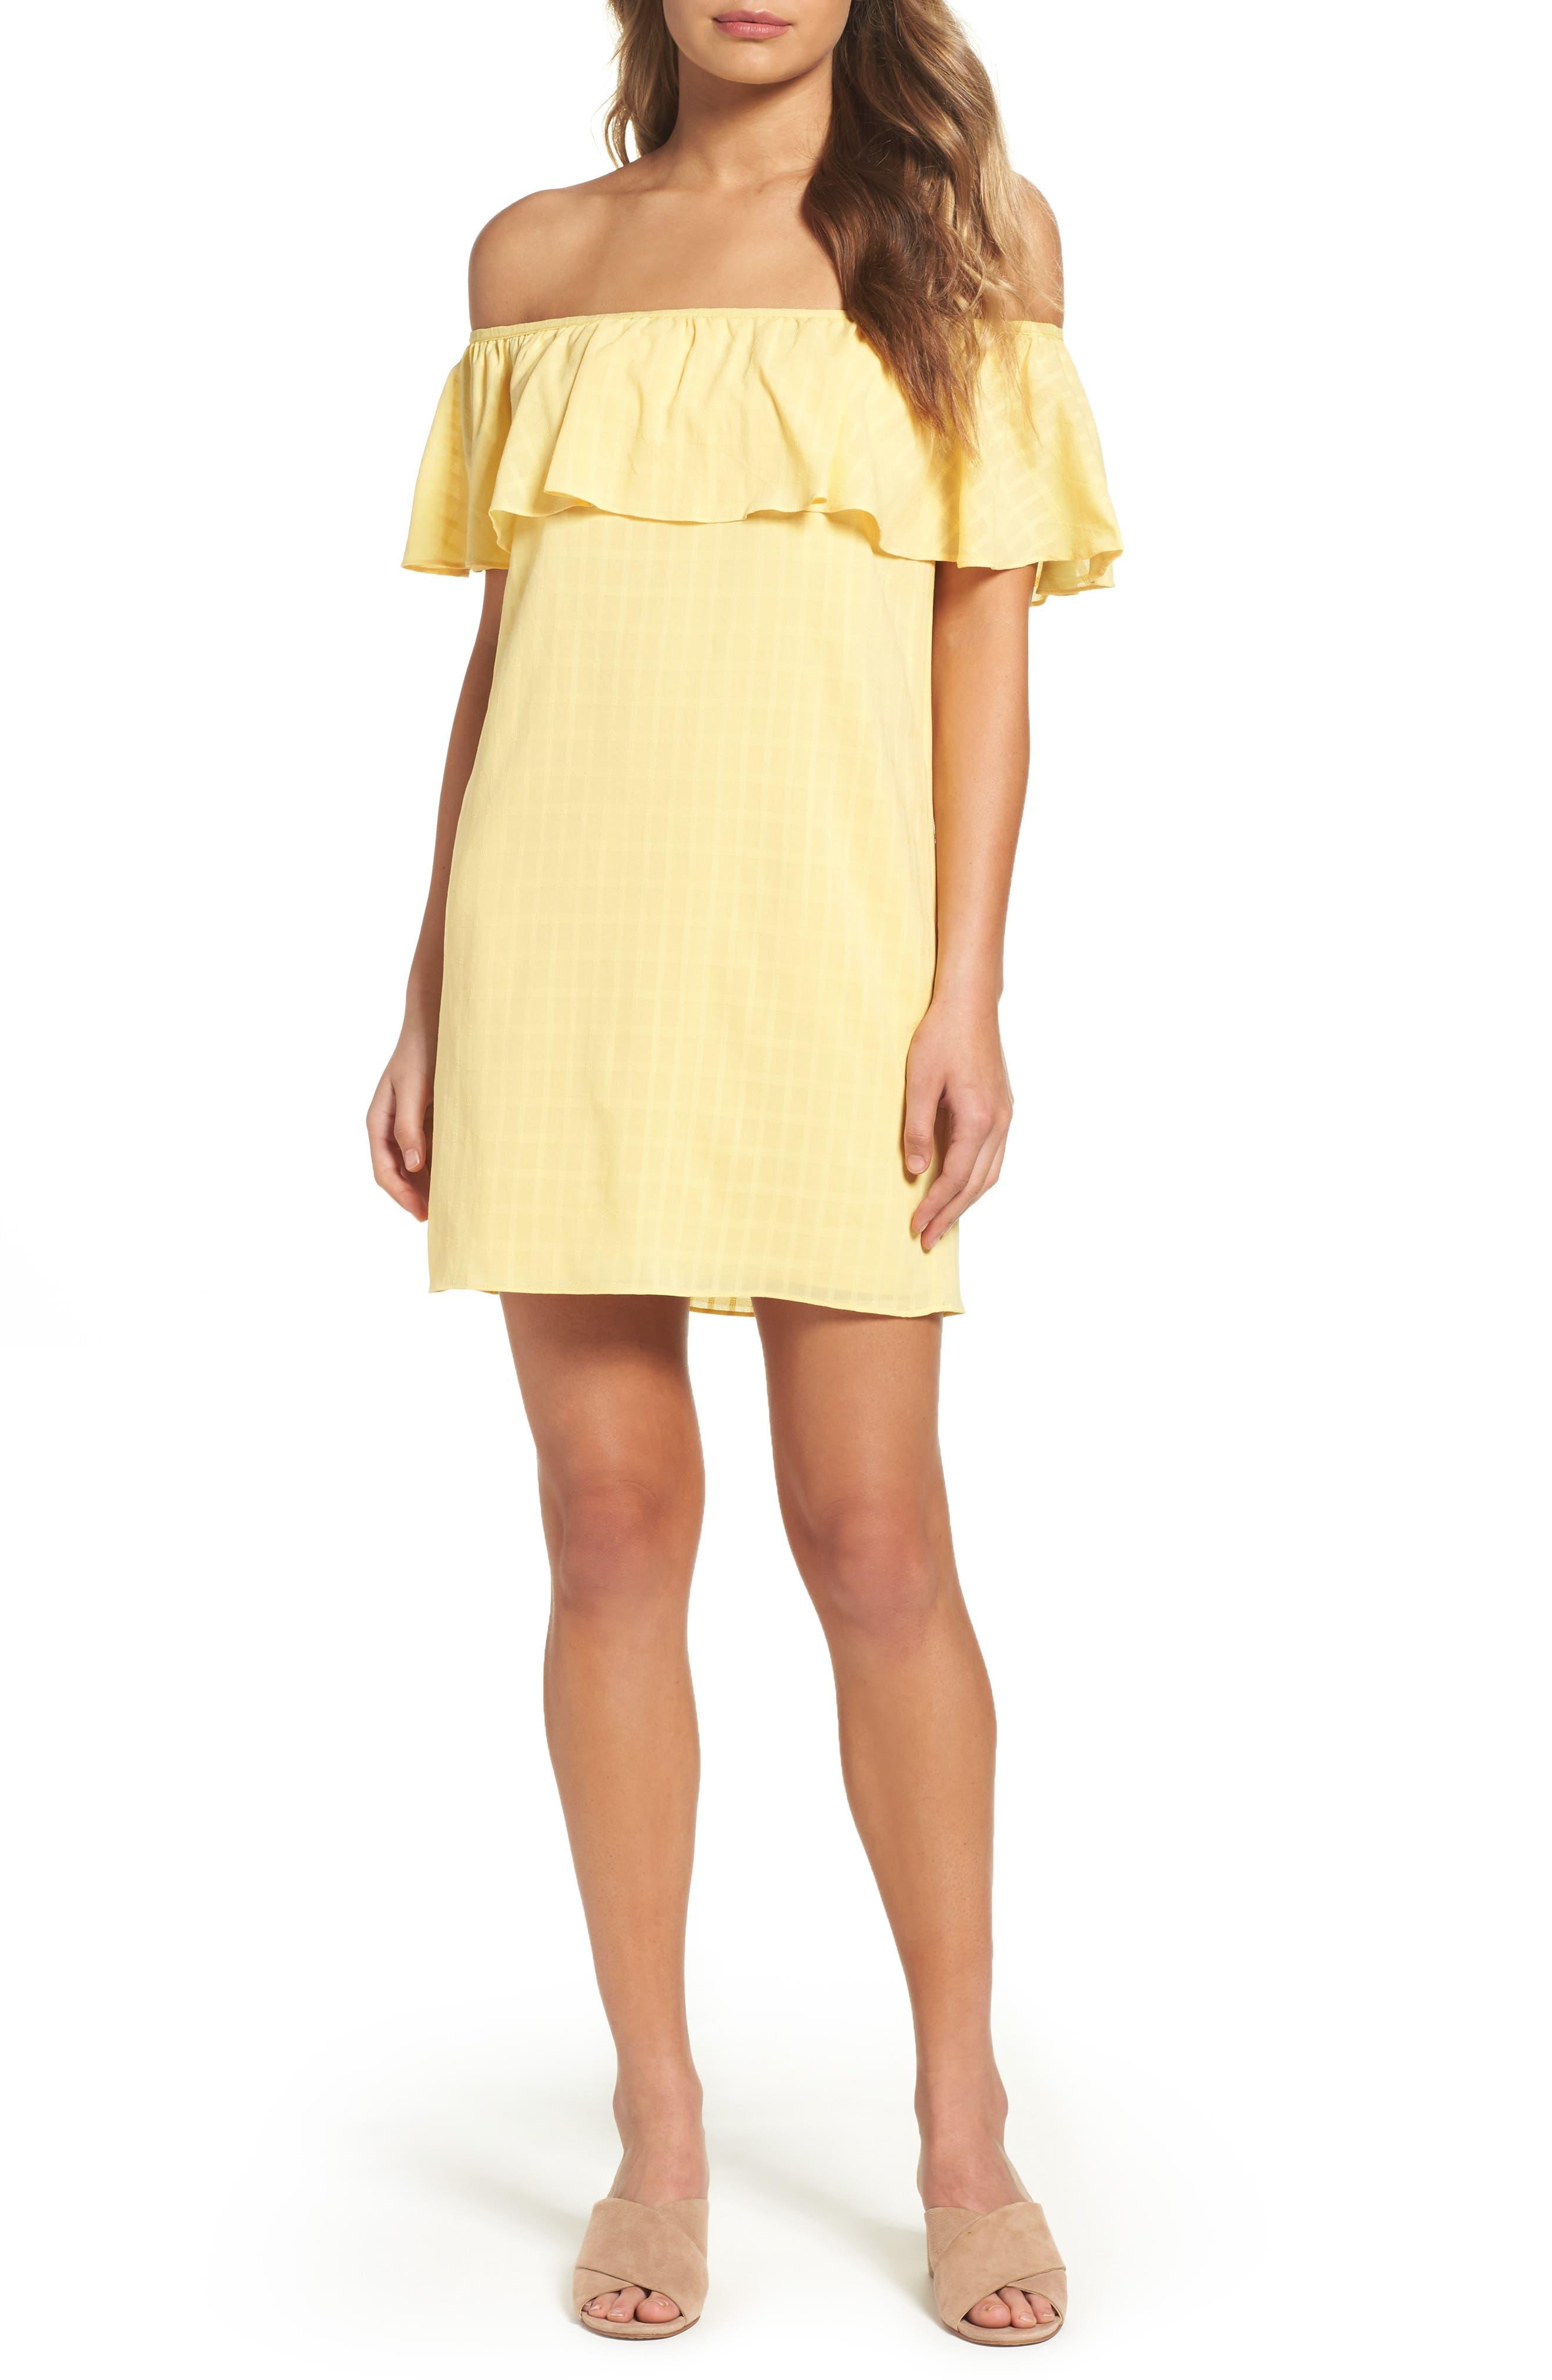 Alternate Image 1 Selected - Ali & Jay Bonita Señorita Shift Dress